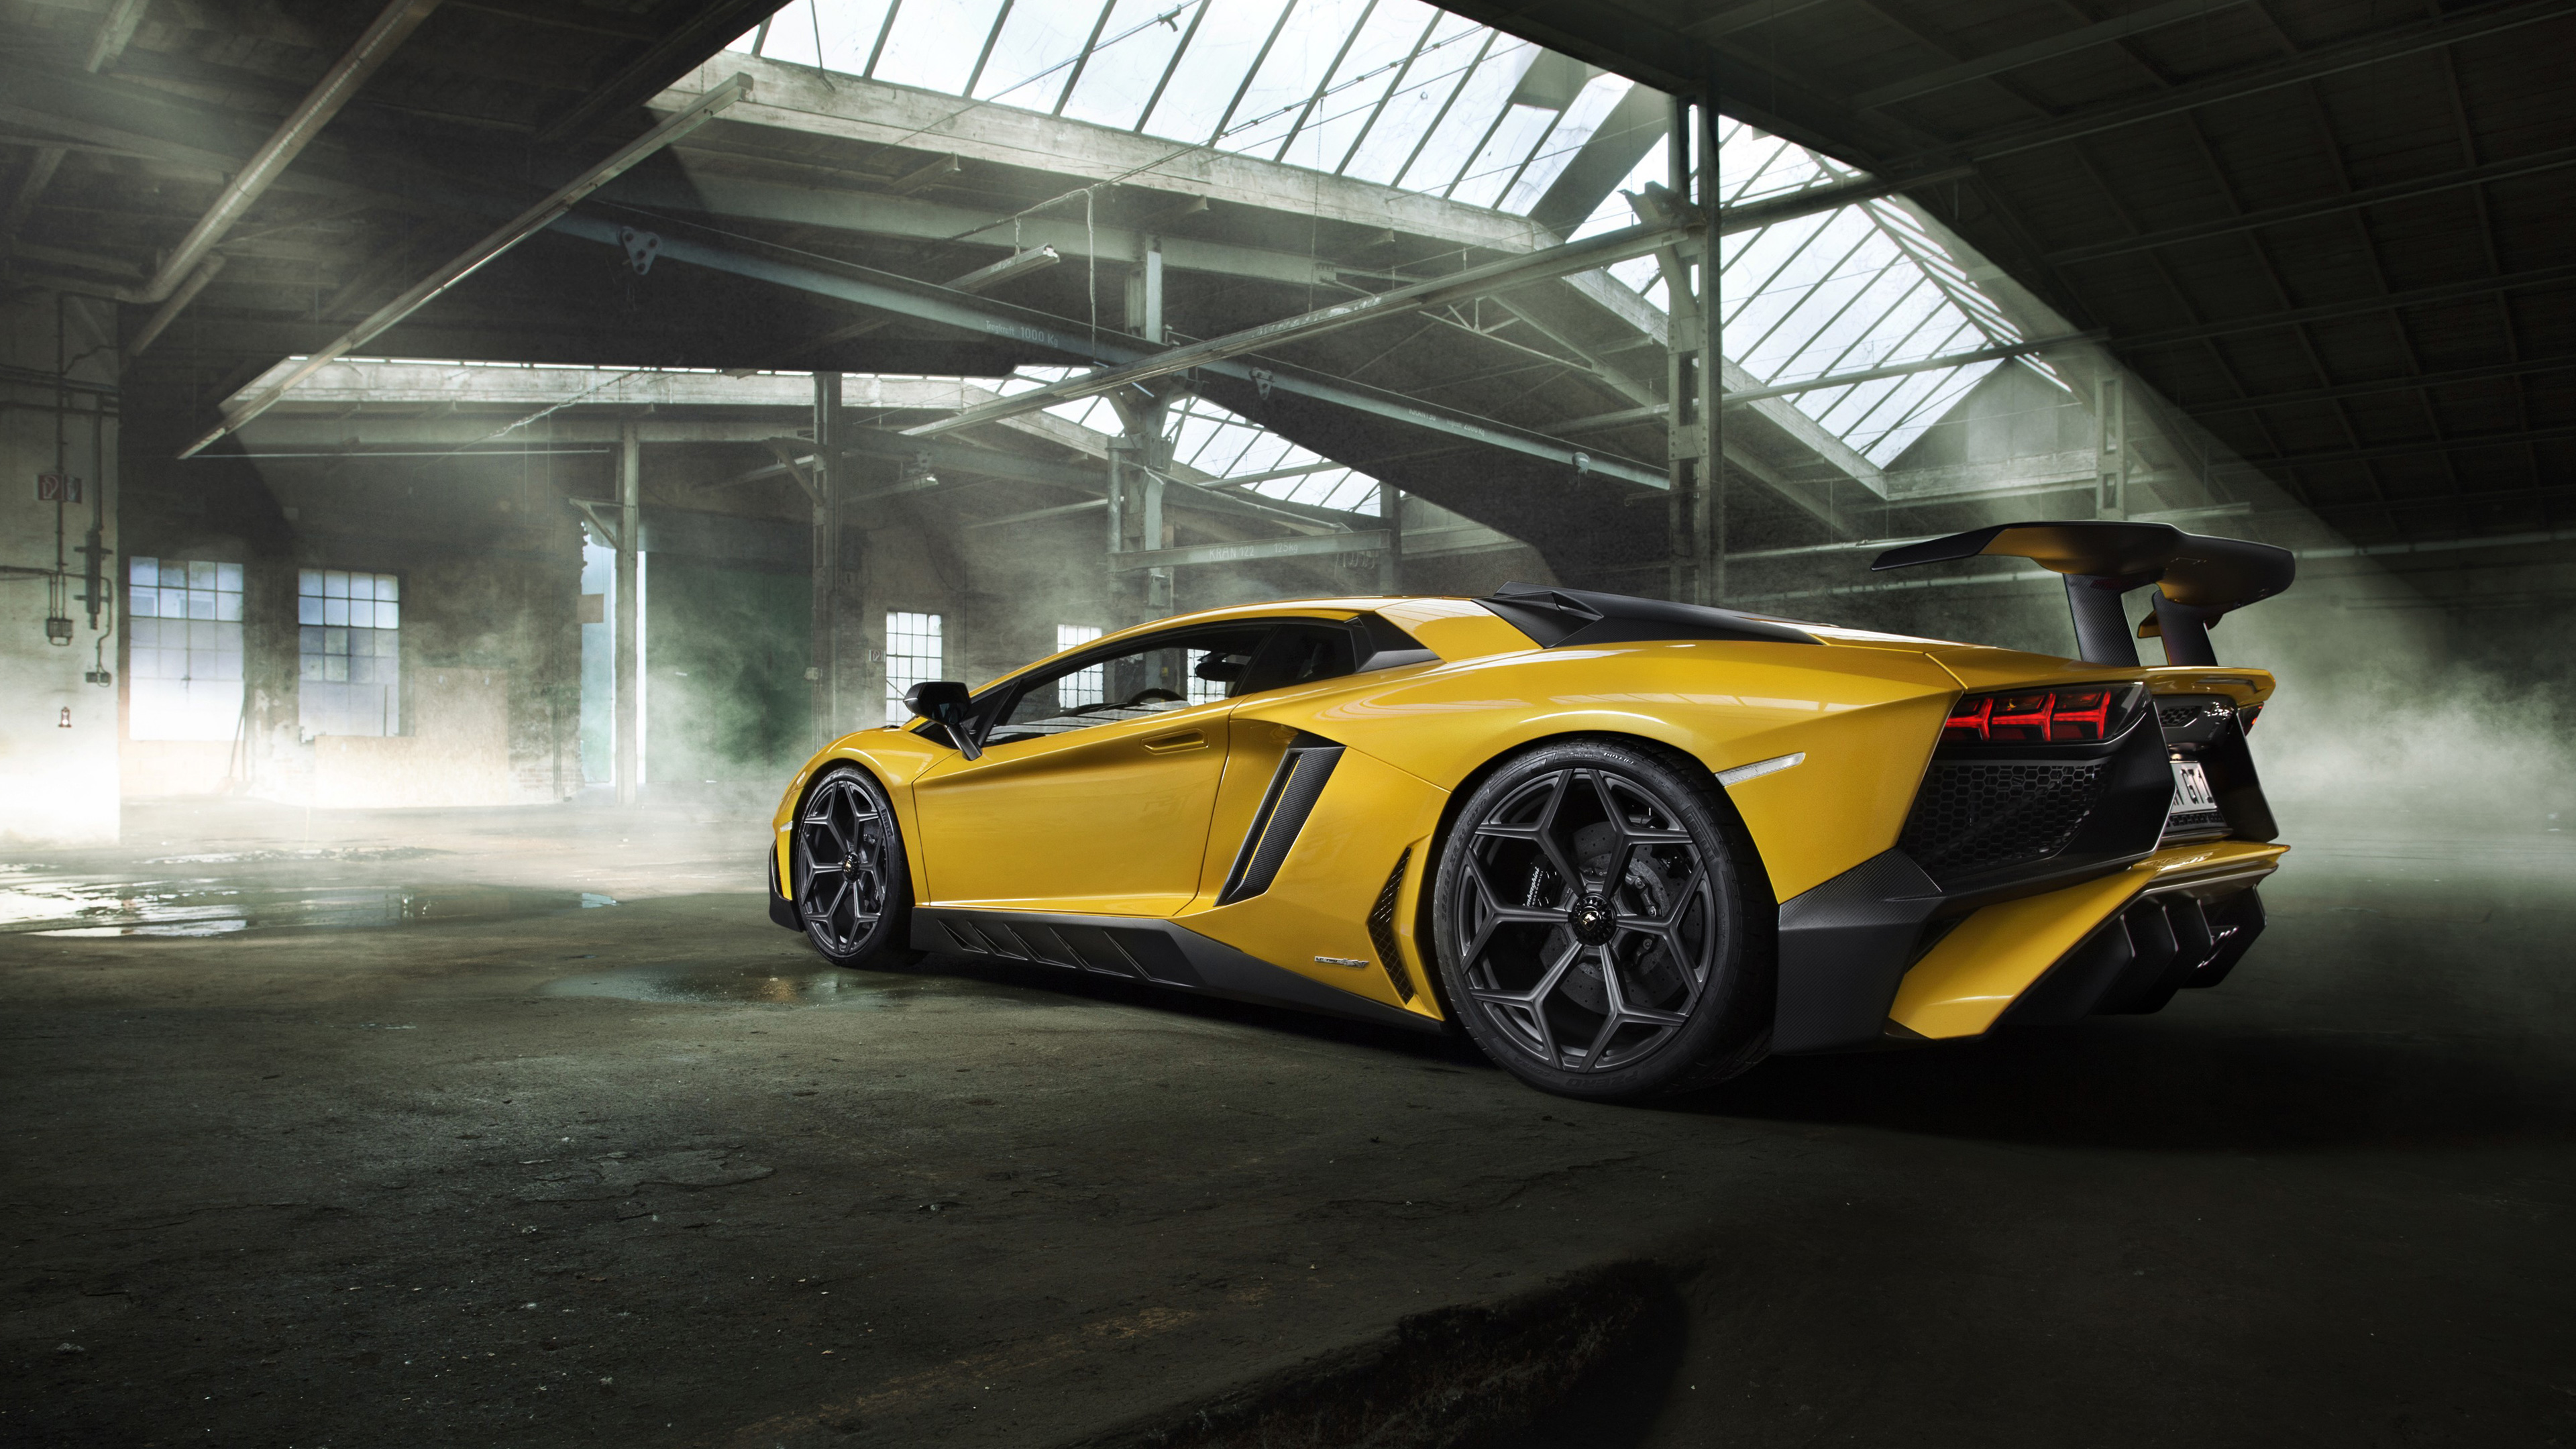 Lamborghini Aventador Superlove HD